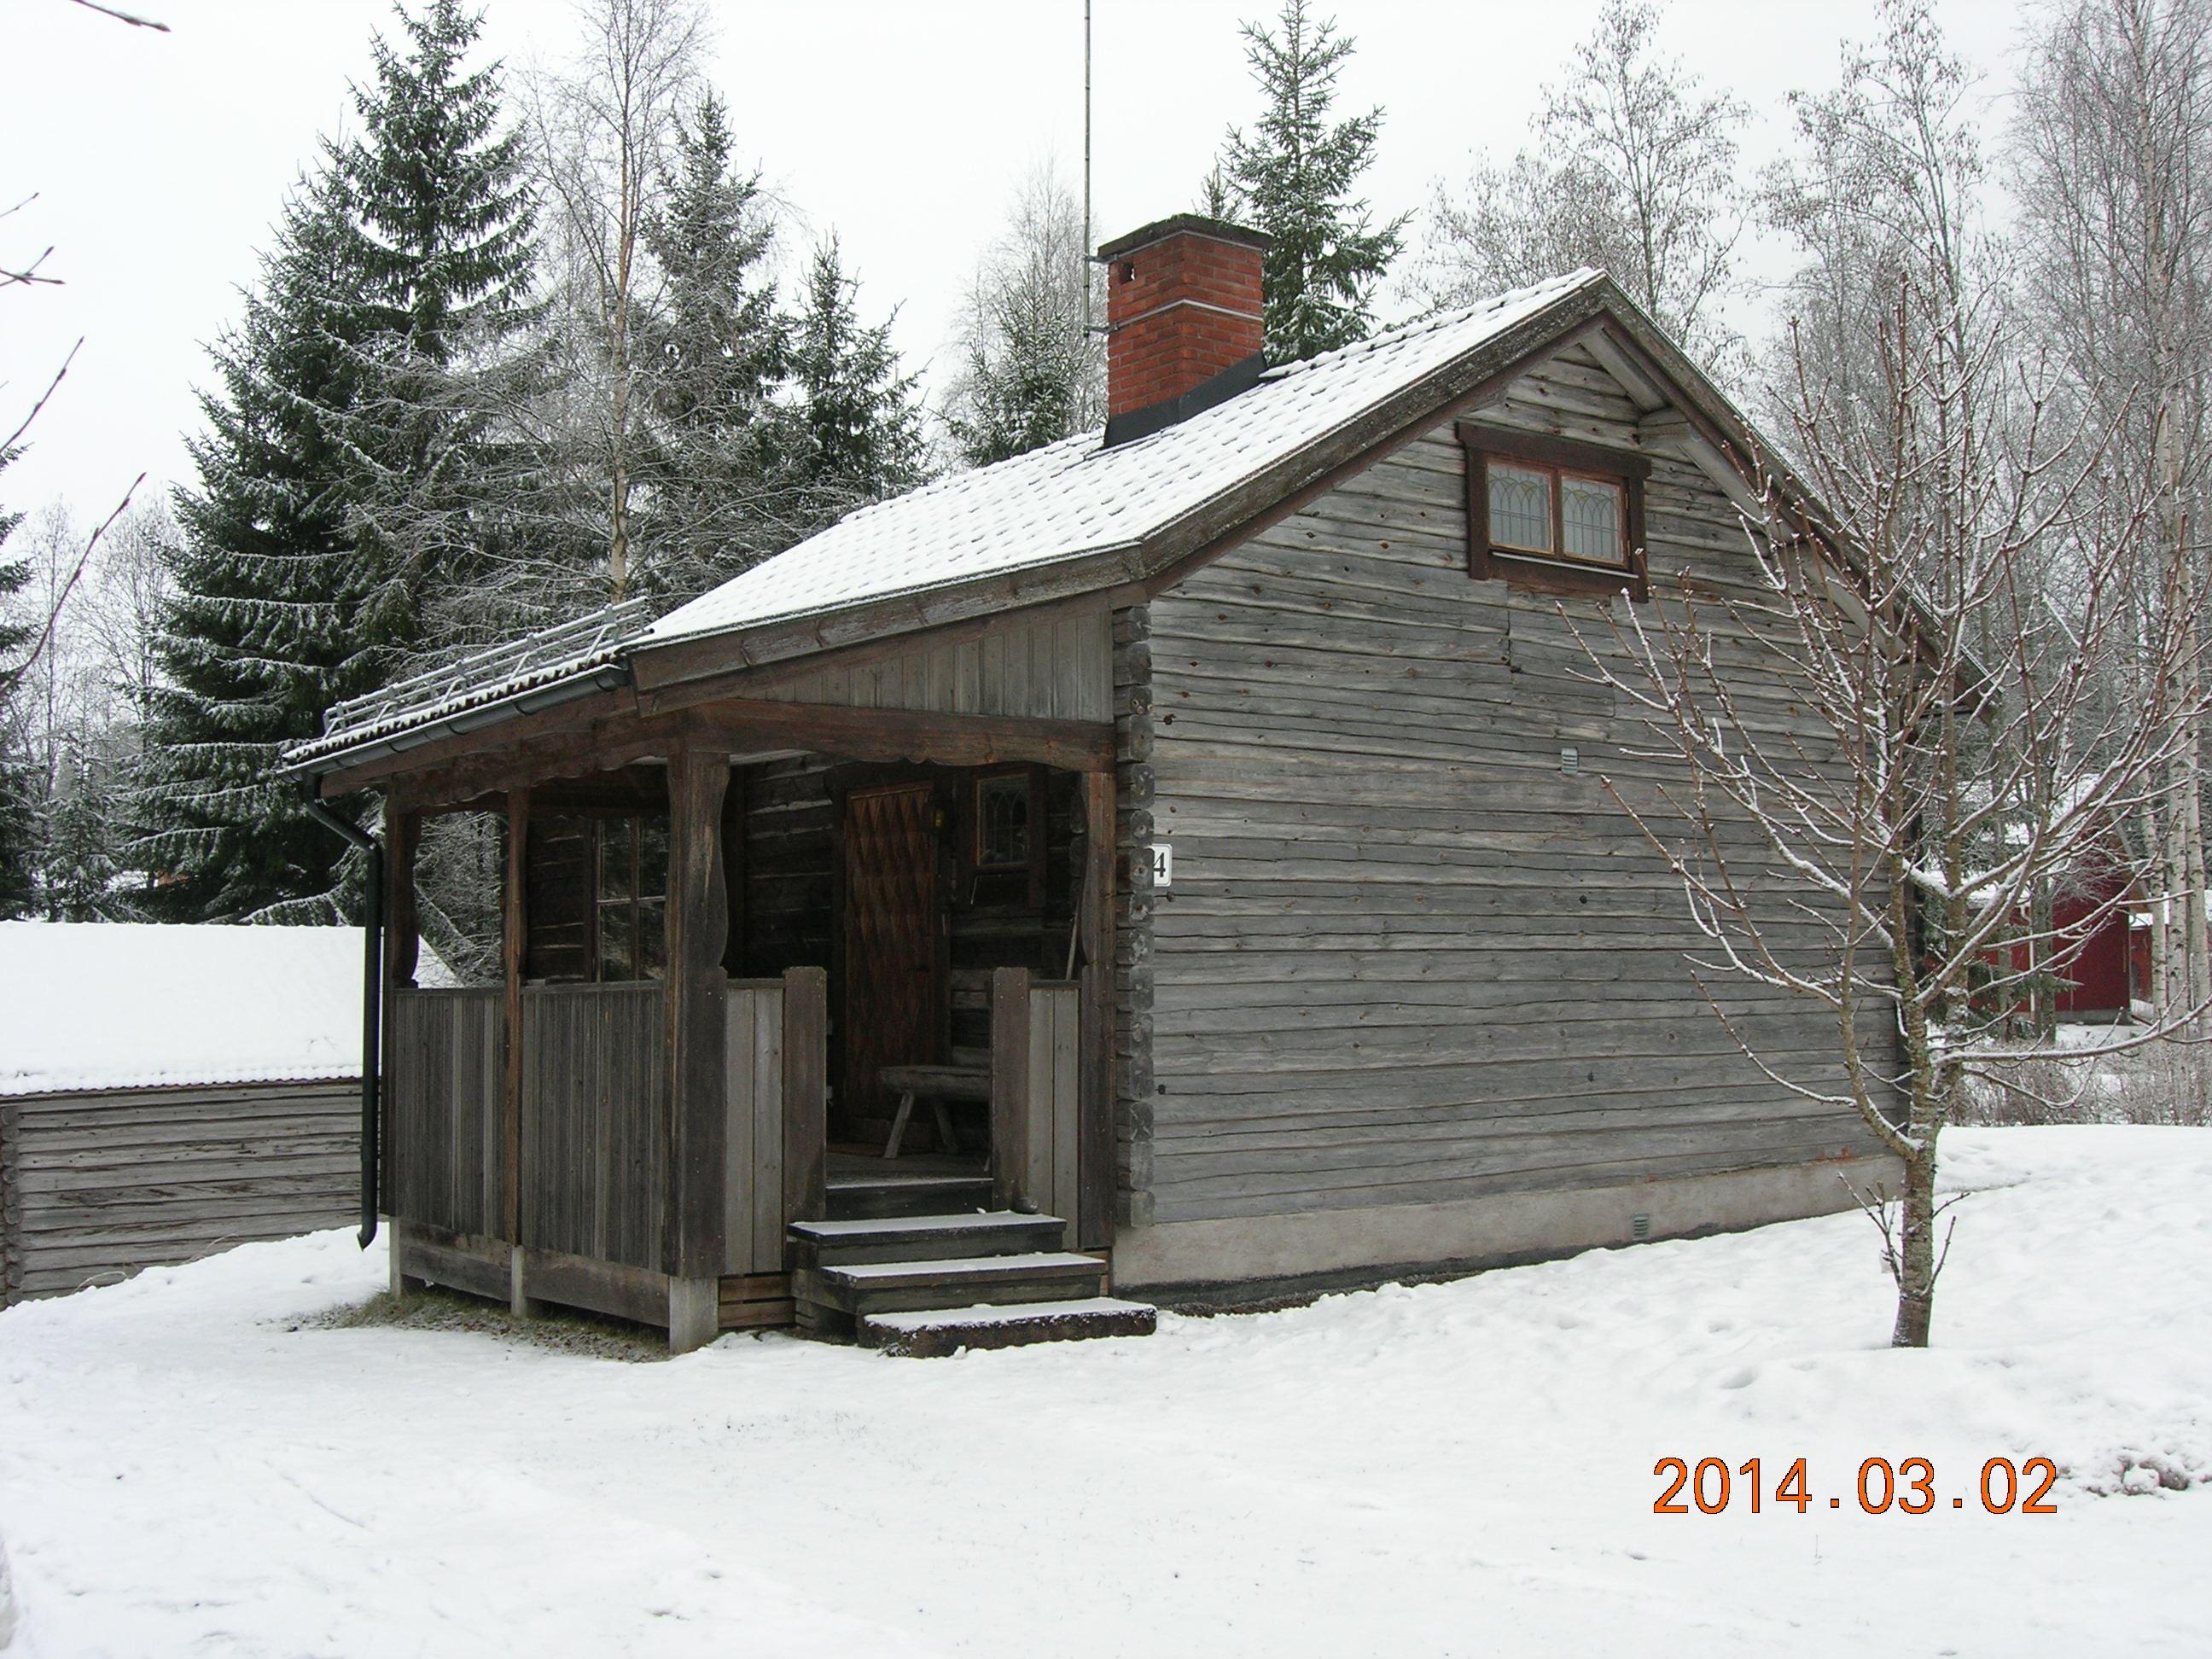 FS418, Bjursås